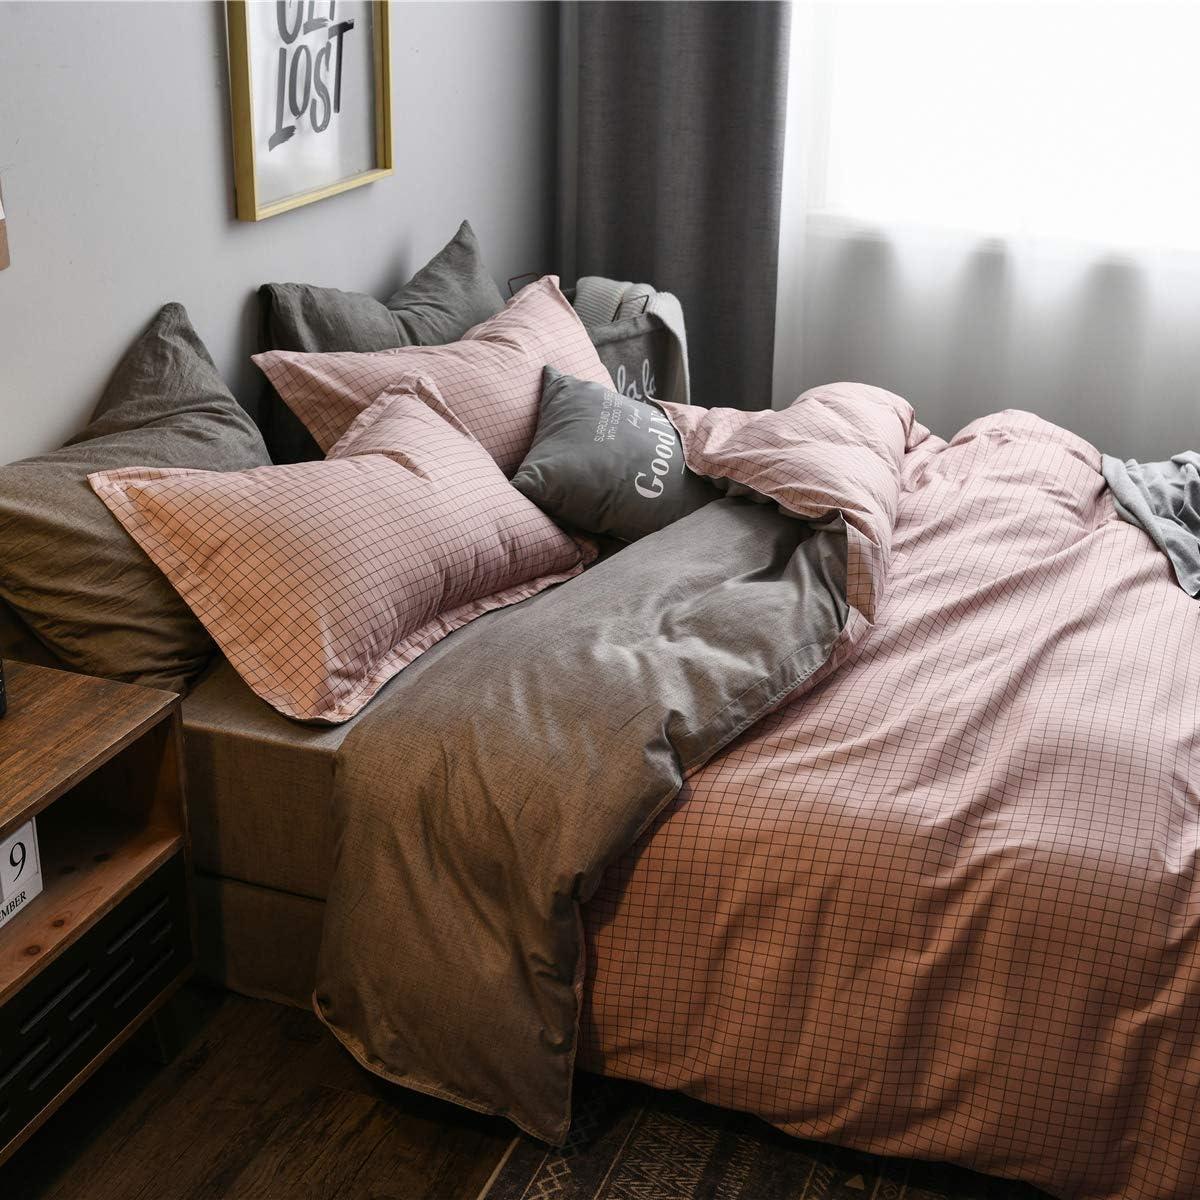 Lurson Blush Pink Gray Plaid Queen Duvet Cover Set Modern Black Mini Grid Geometric Gingham Checker Reversible Bedding Set Full Size Soft Hypoallergenic Microfiber Check Comforter Covers 3pcs